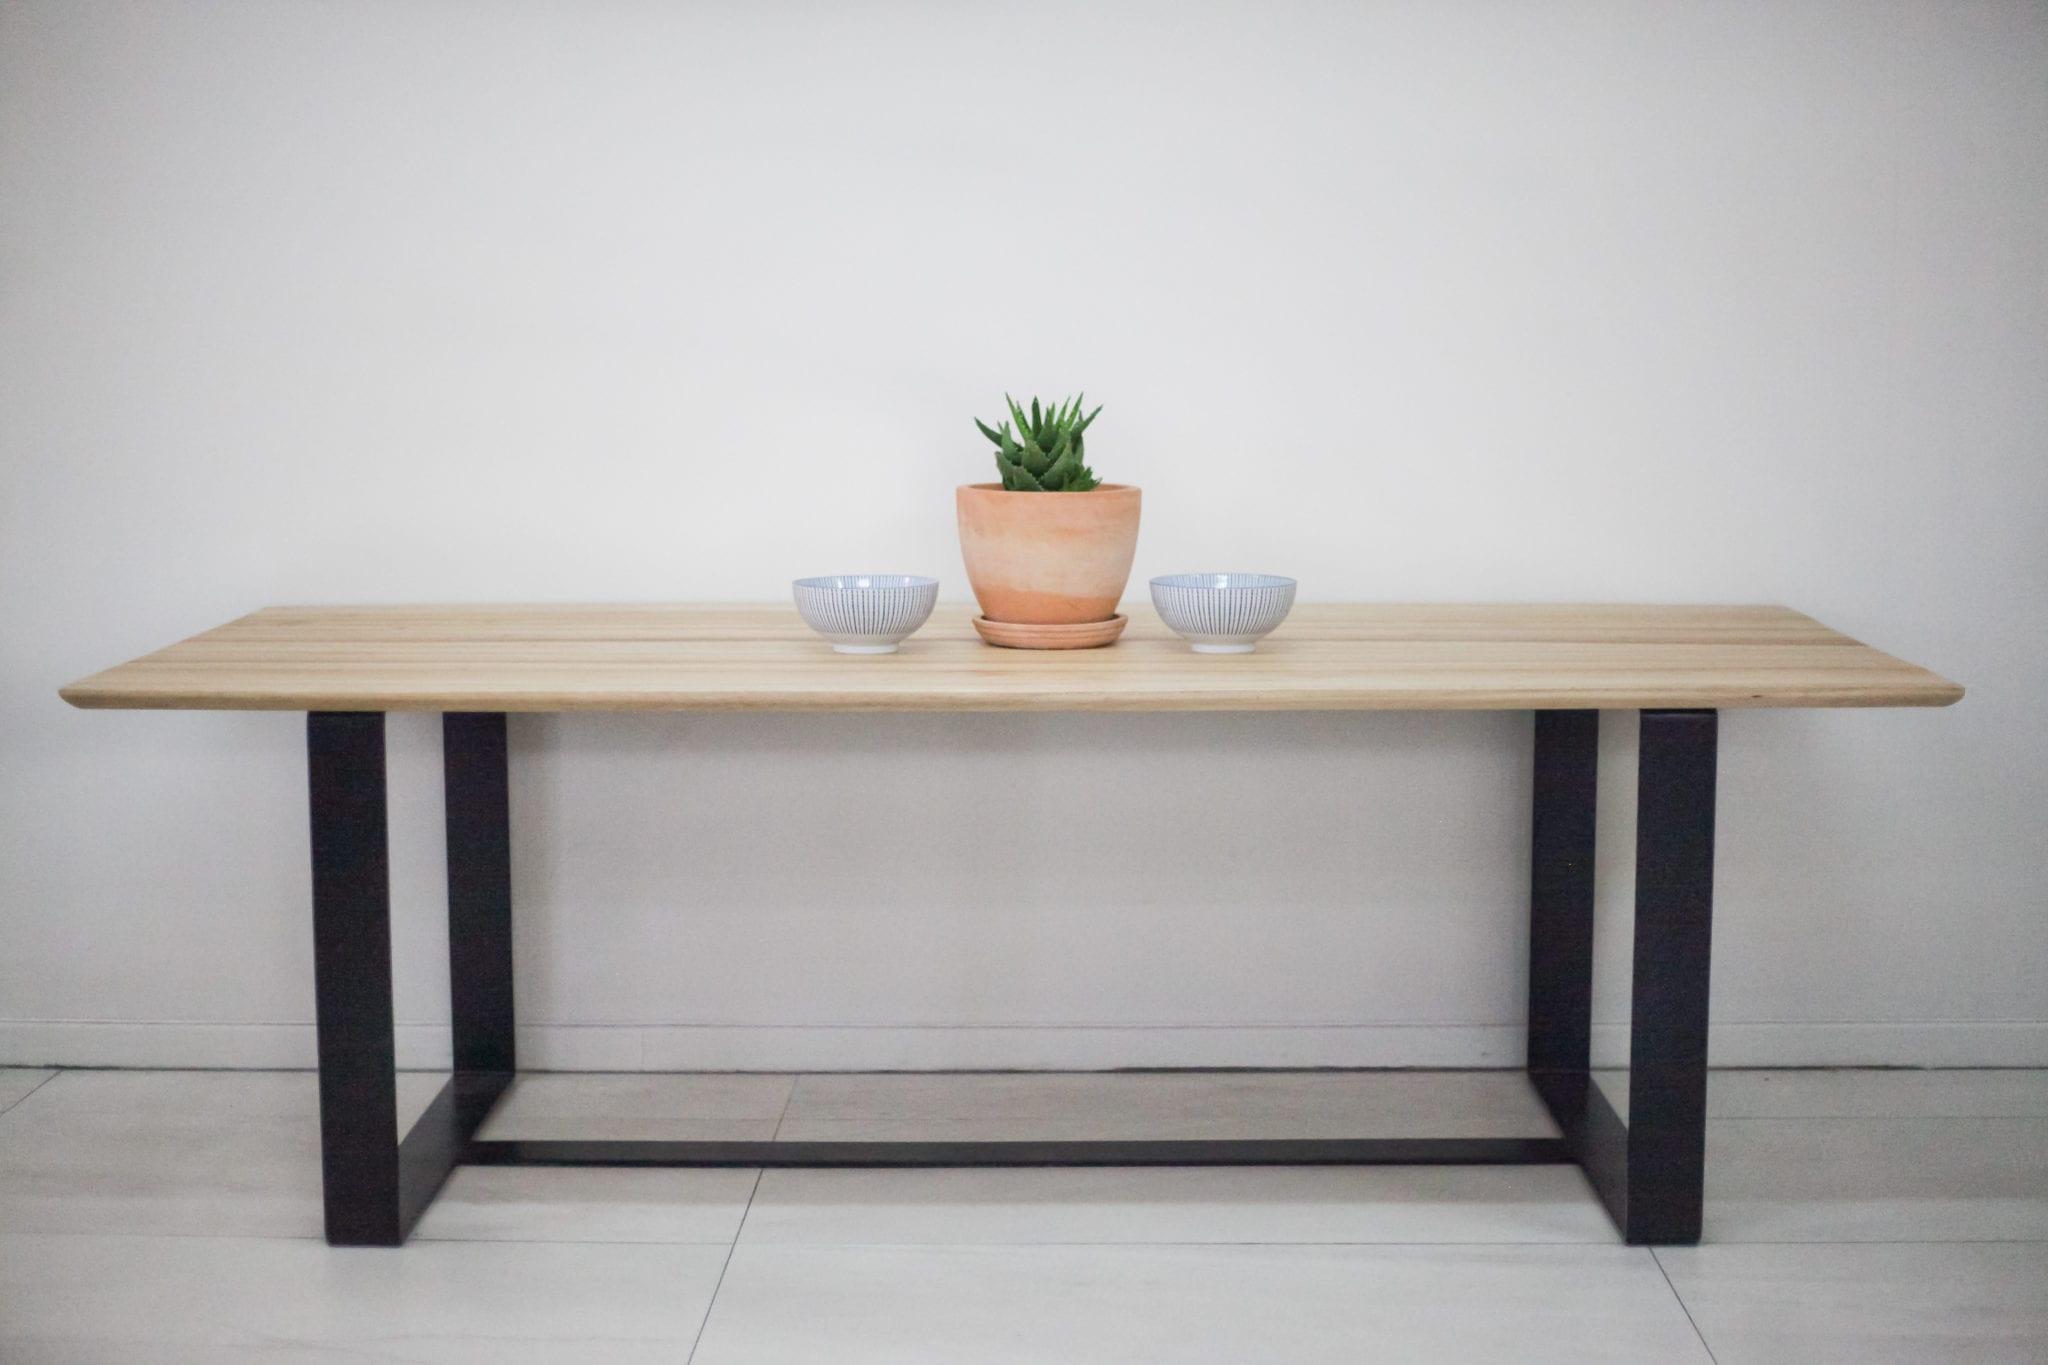 Flat bar steel frame dining table Blackwood top - Eco ...